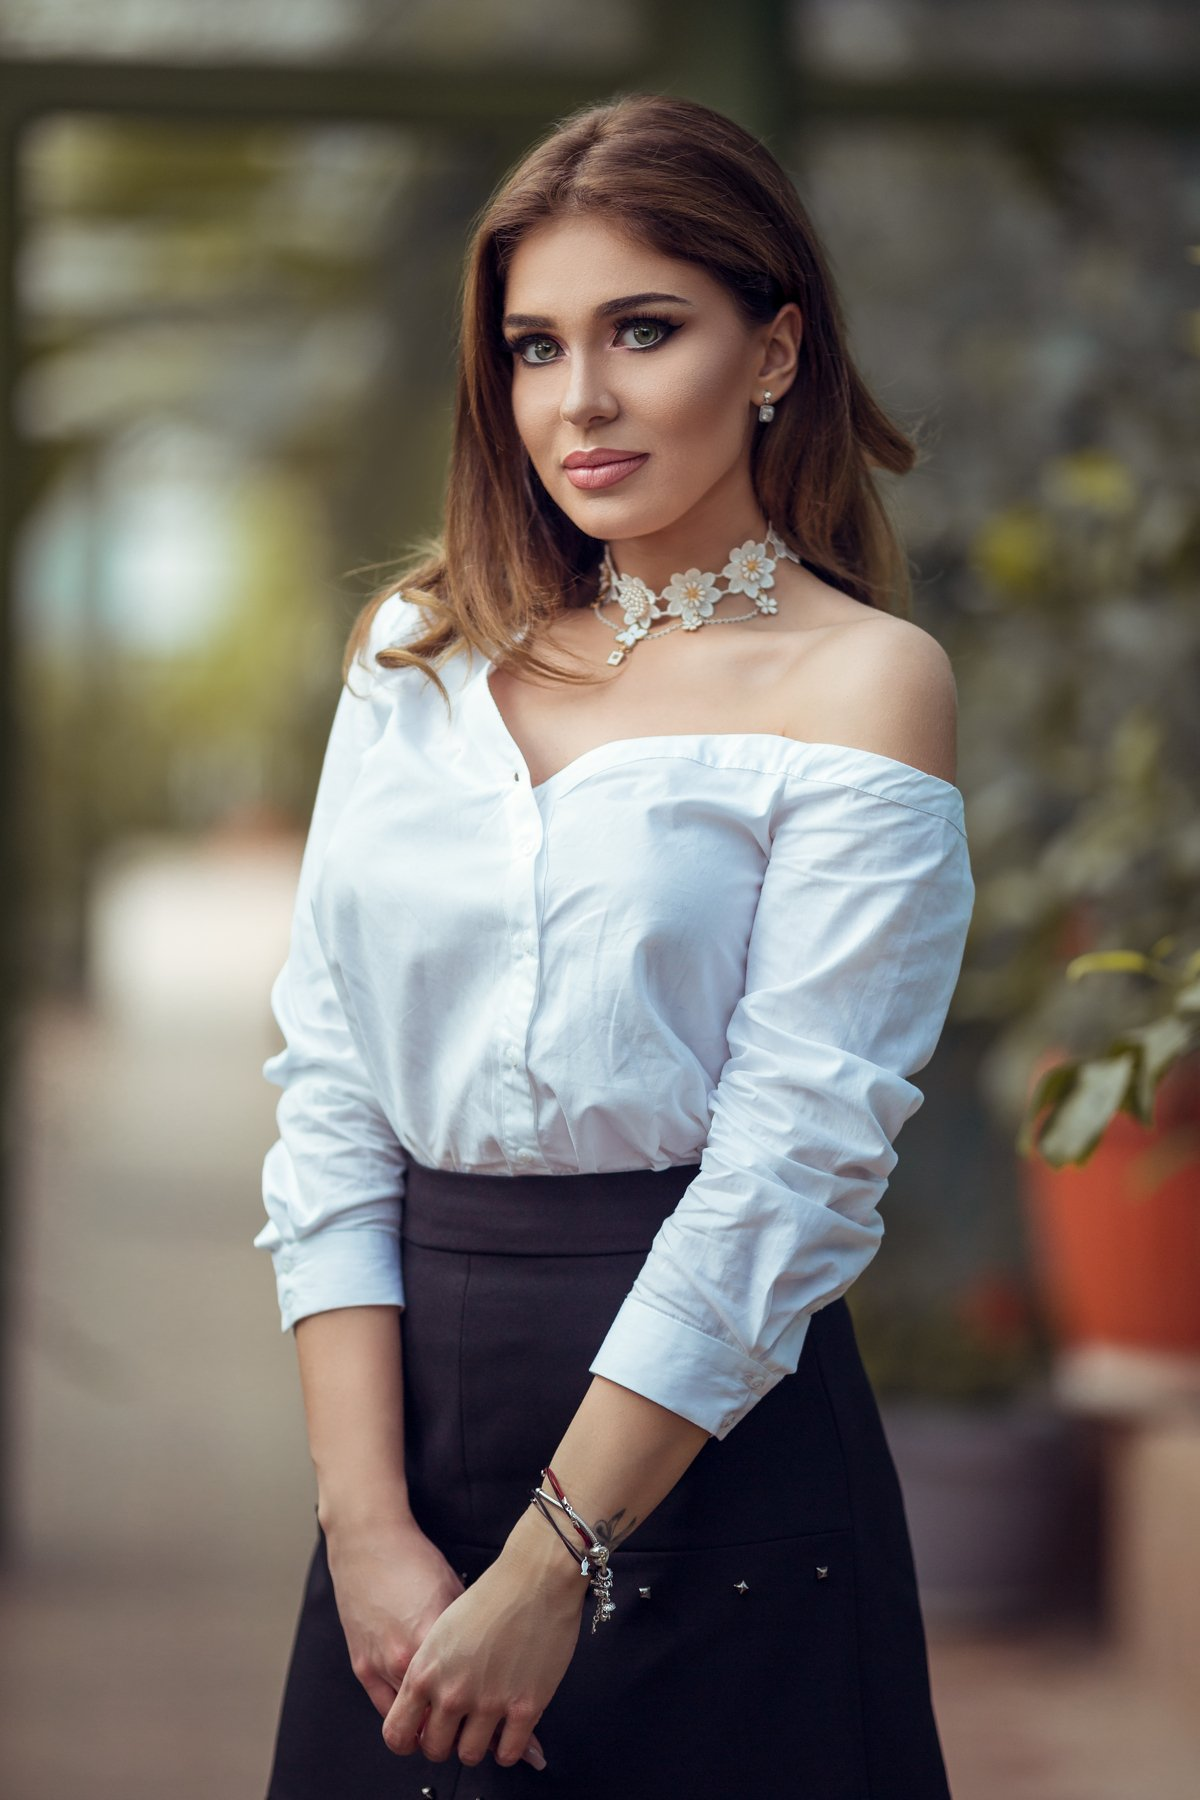 girl, model, canon, retouch, photography, 135mm, bokeh, beauty, fashion, portrait, photoshop, romania, bucharest, Andrei Marginean